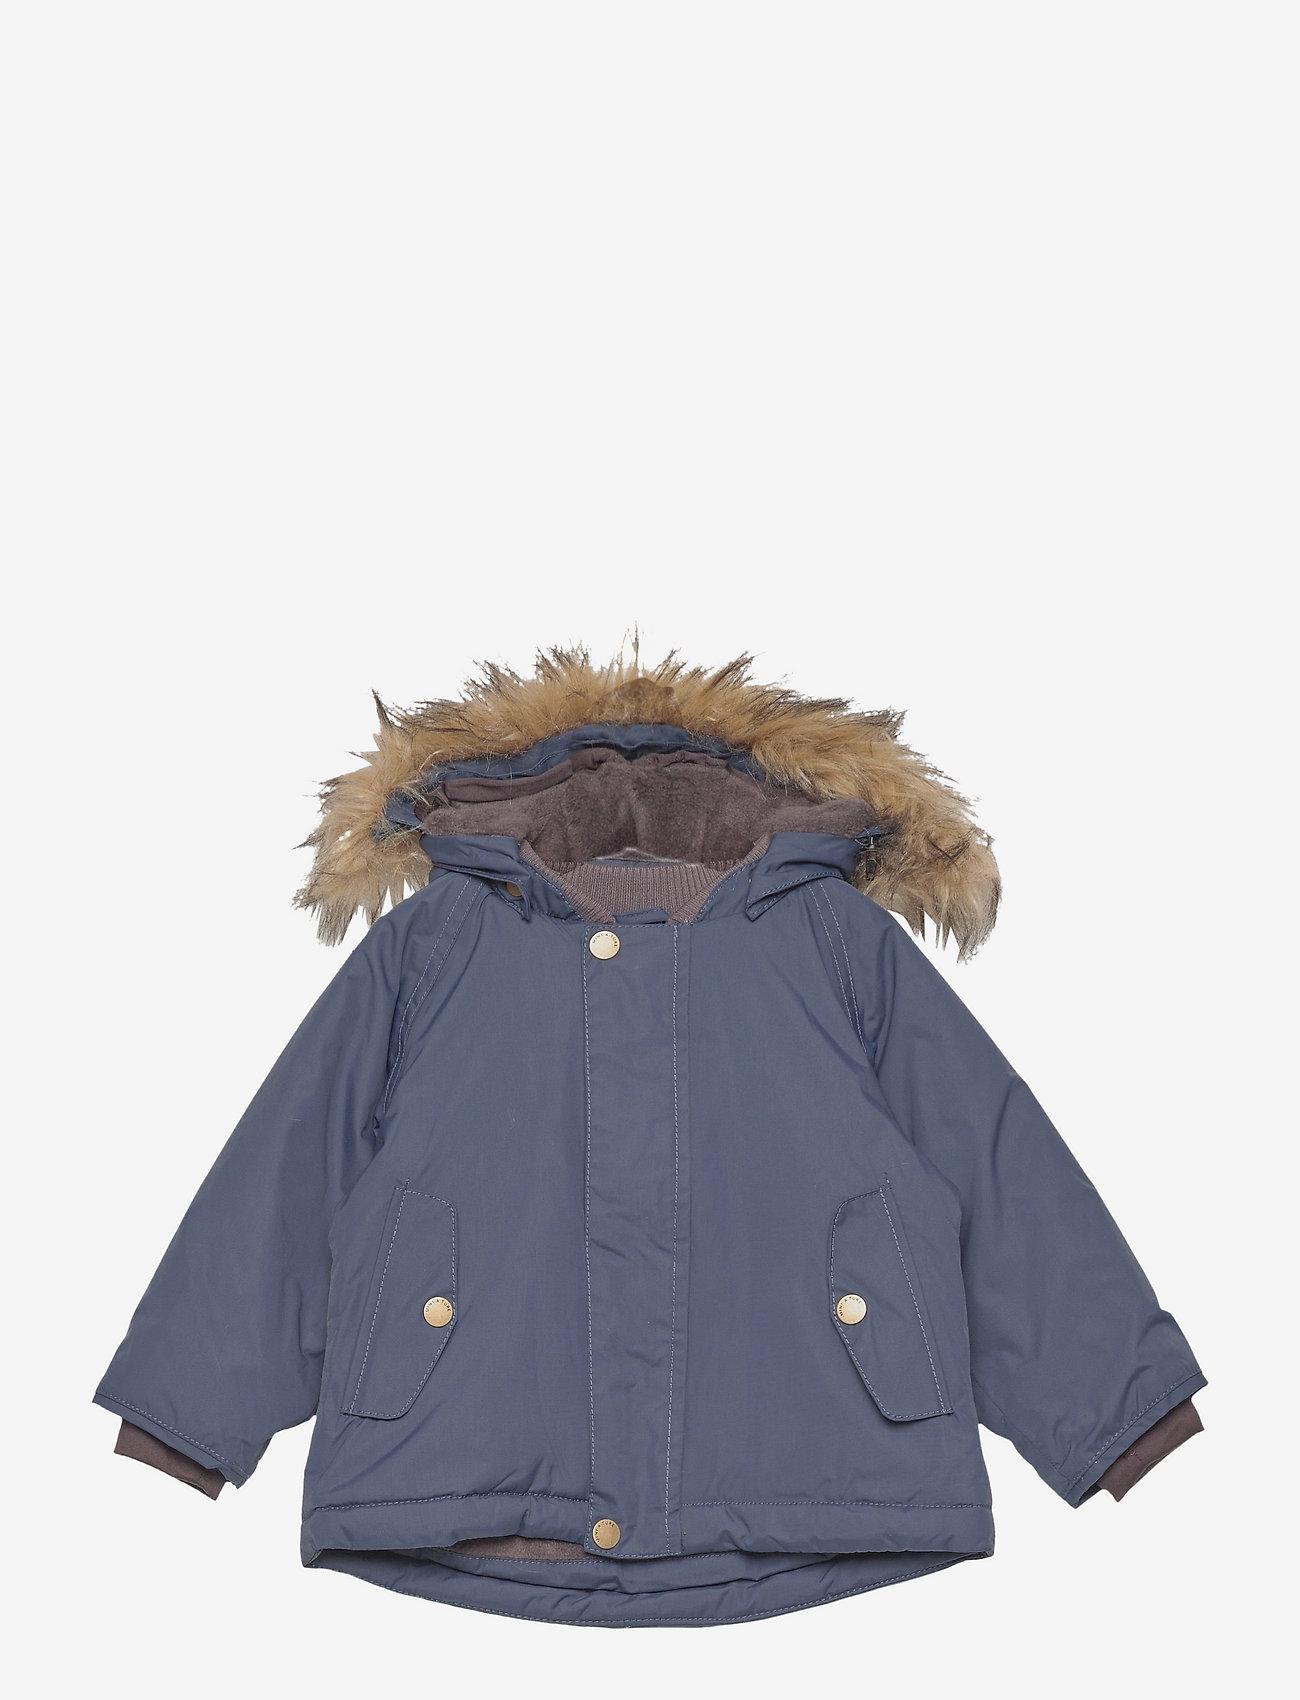 Mini A Ture - Wally Fake Fur Jacket, M - winter jacket - blue nights - 0